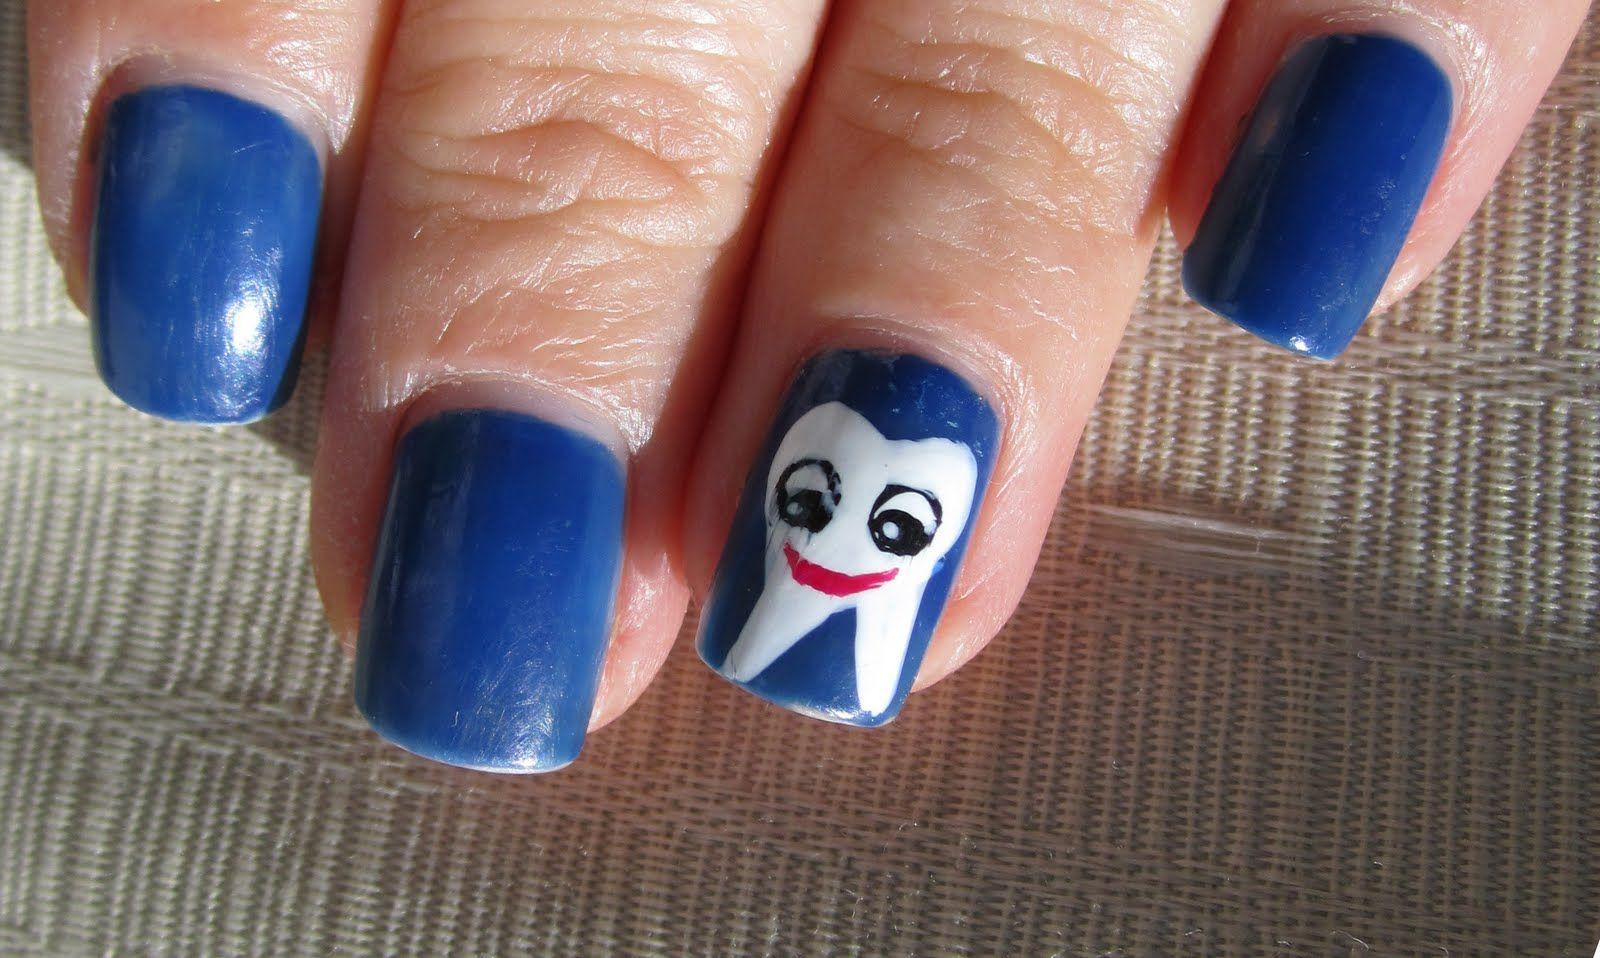 Pin de Phan Dental en Dentistry: Nail Art! | Pinterest